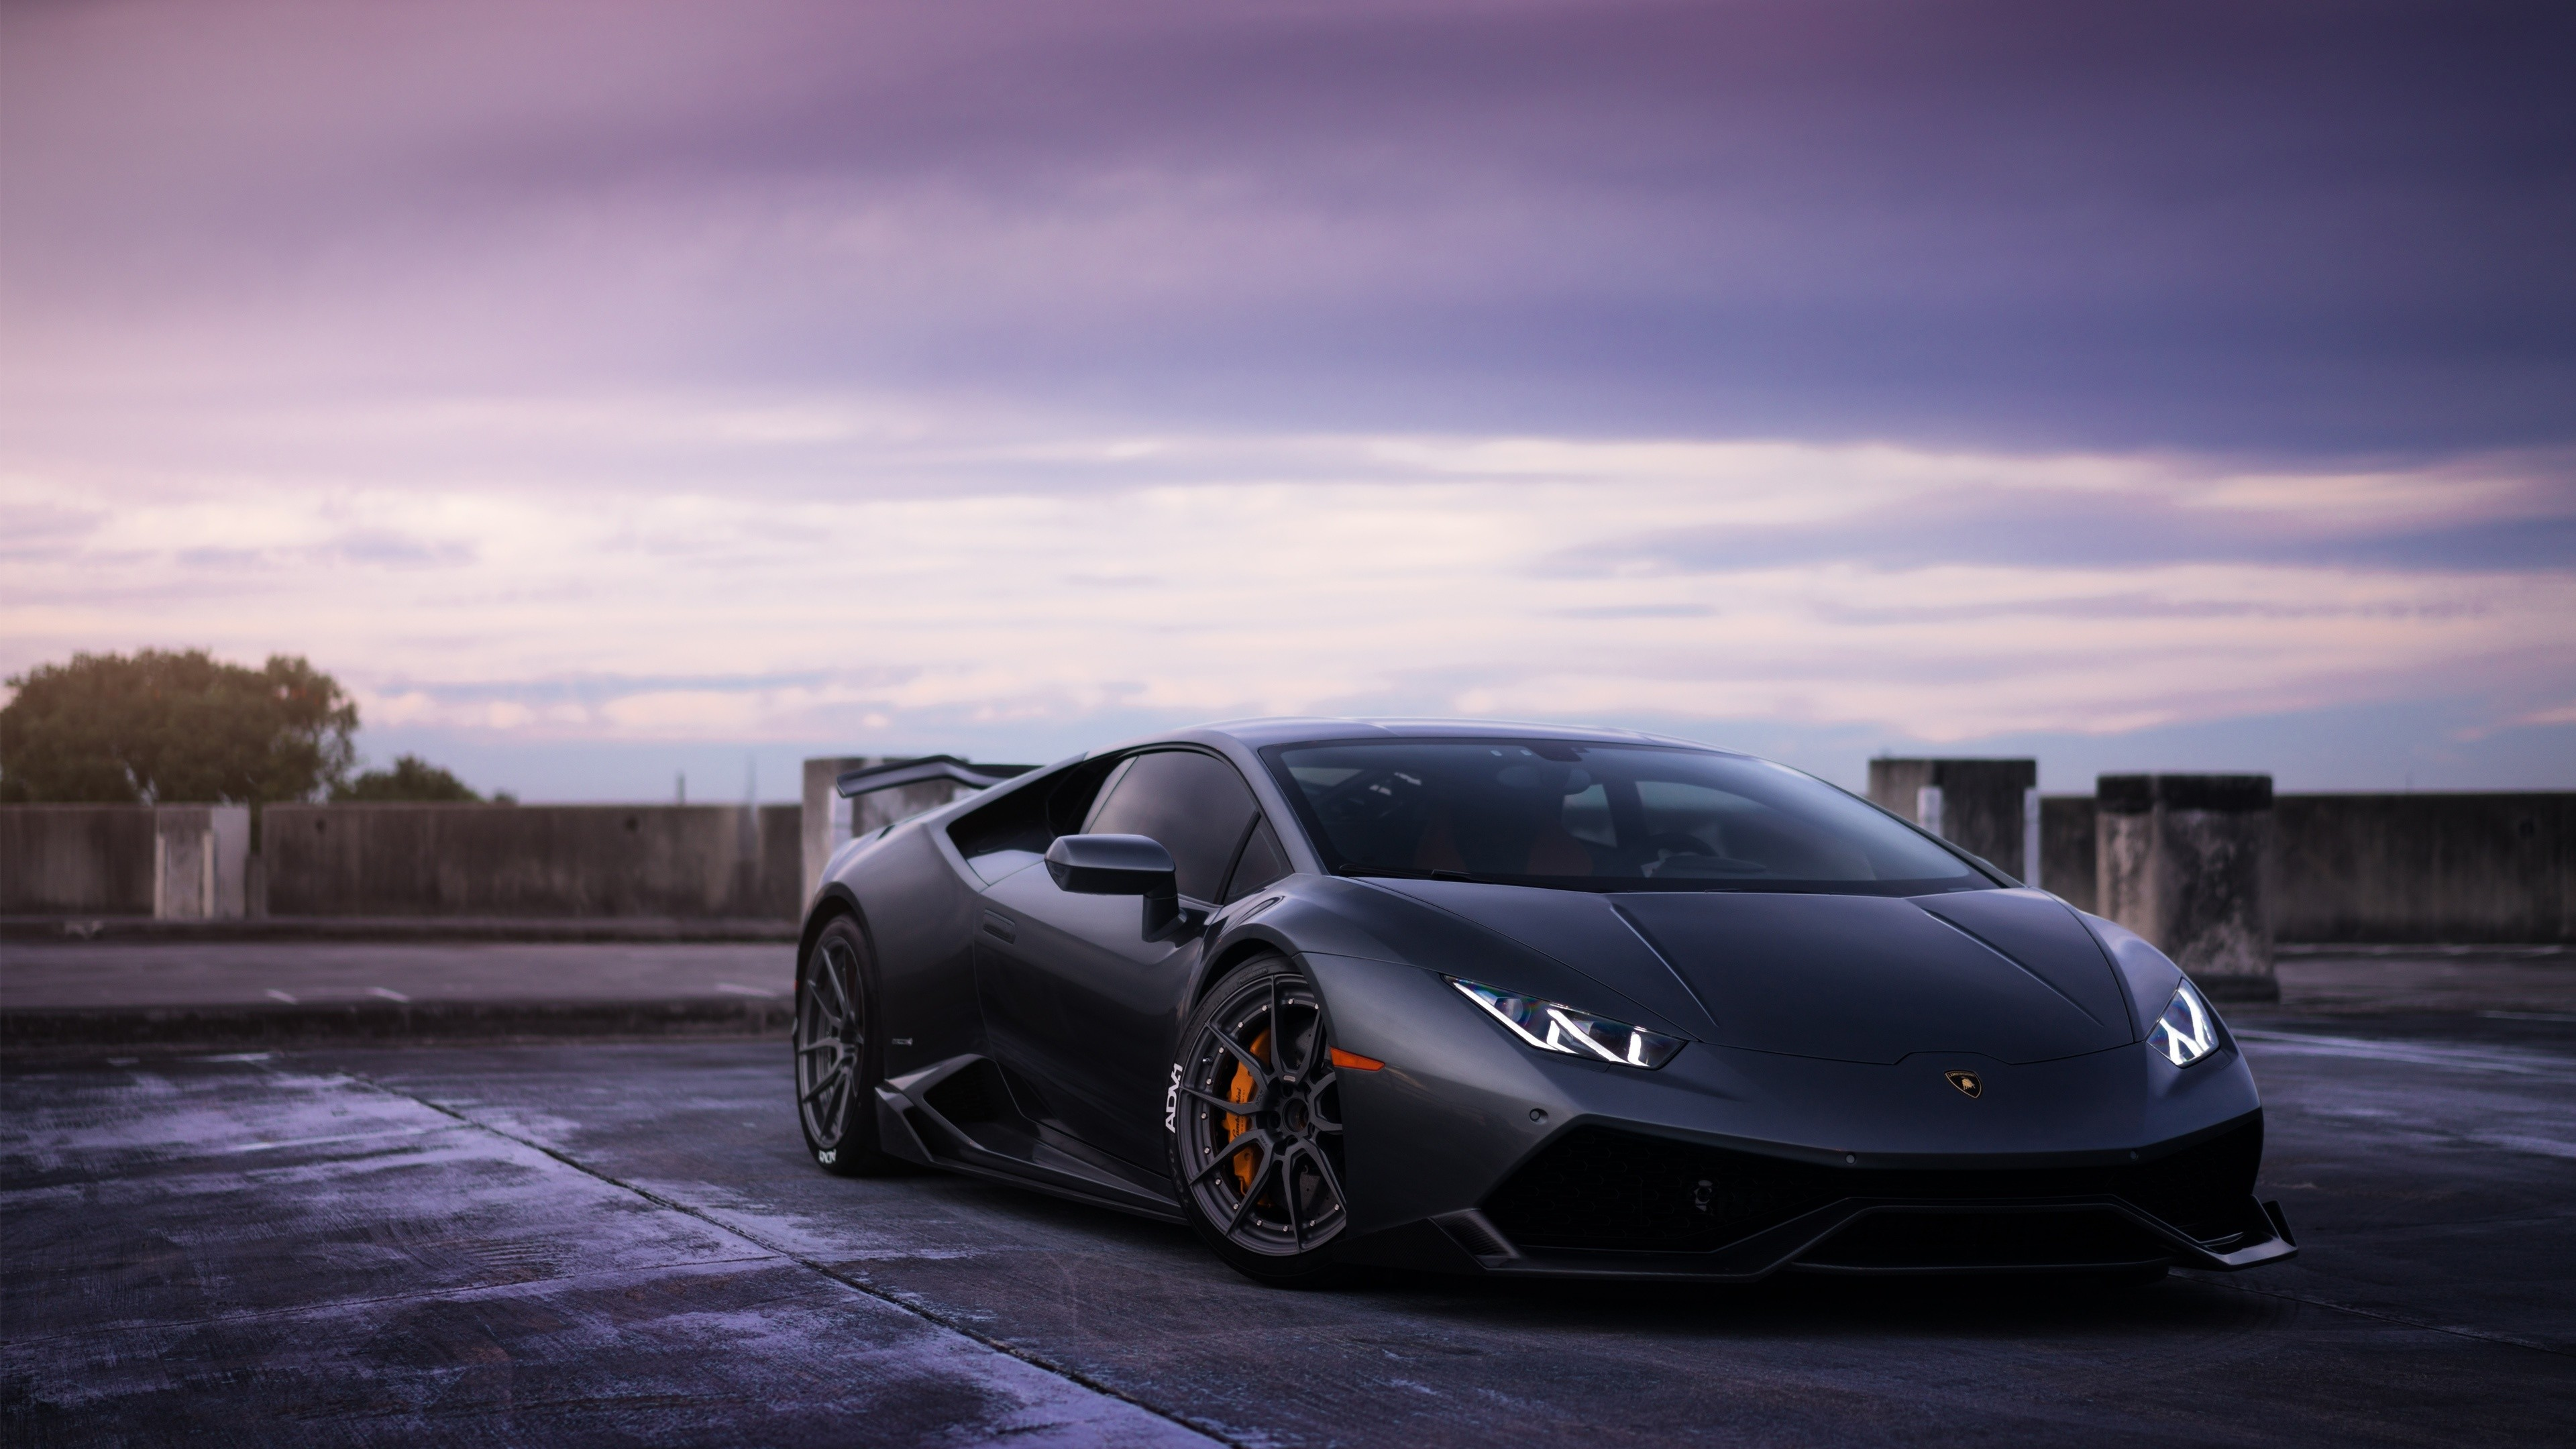 New Lamborghini Wallpaper Wallpapertag